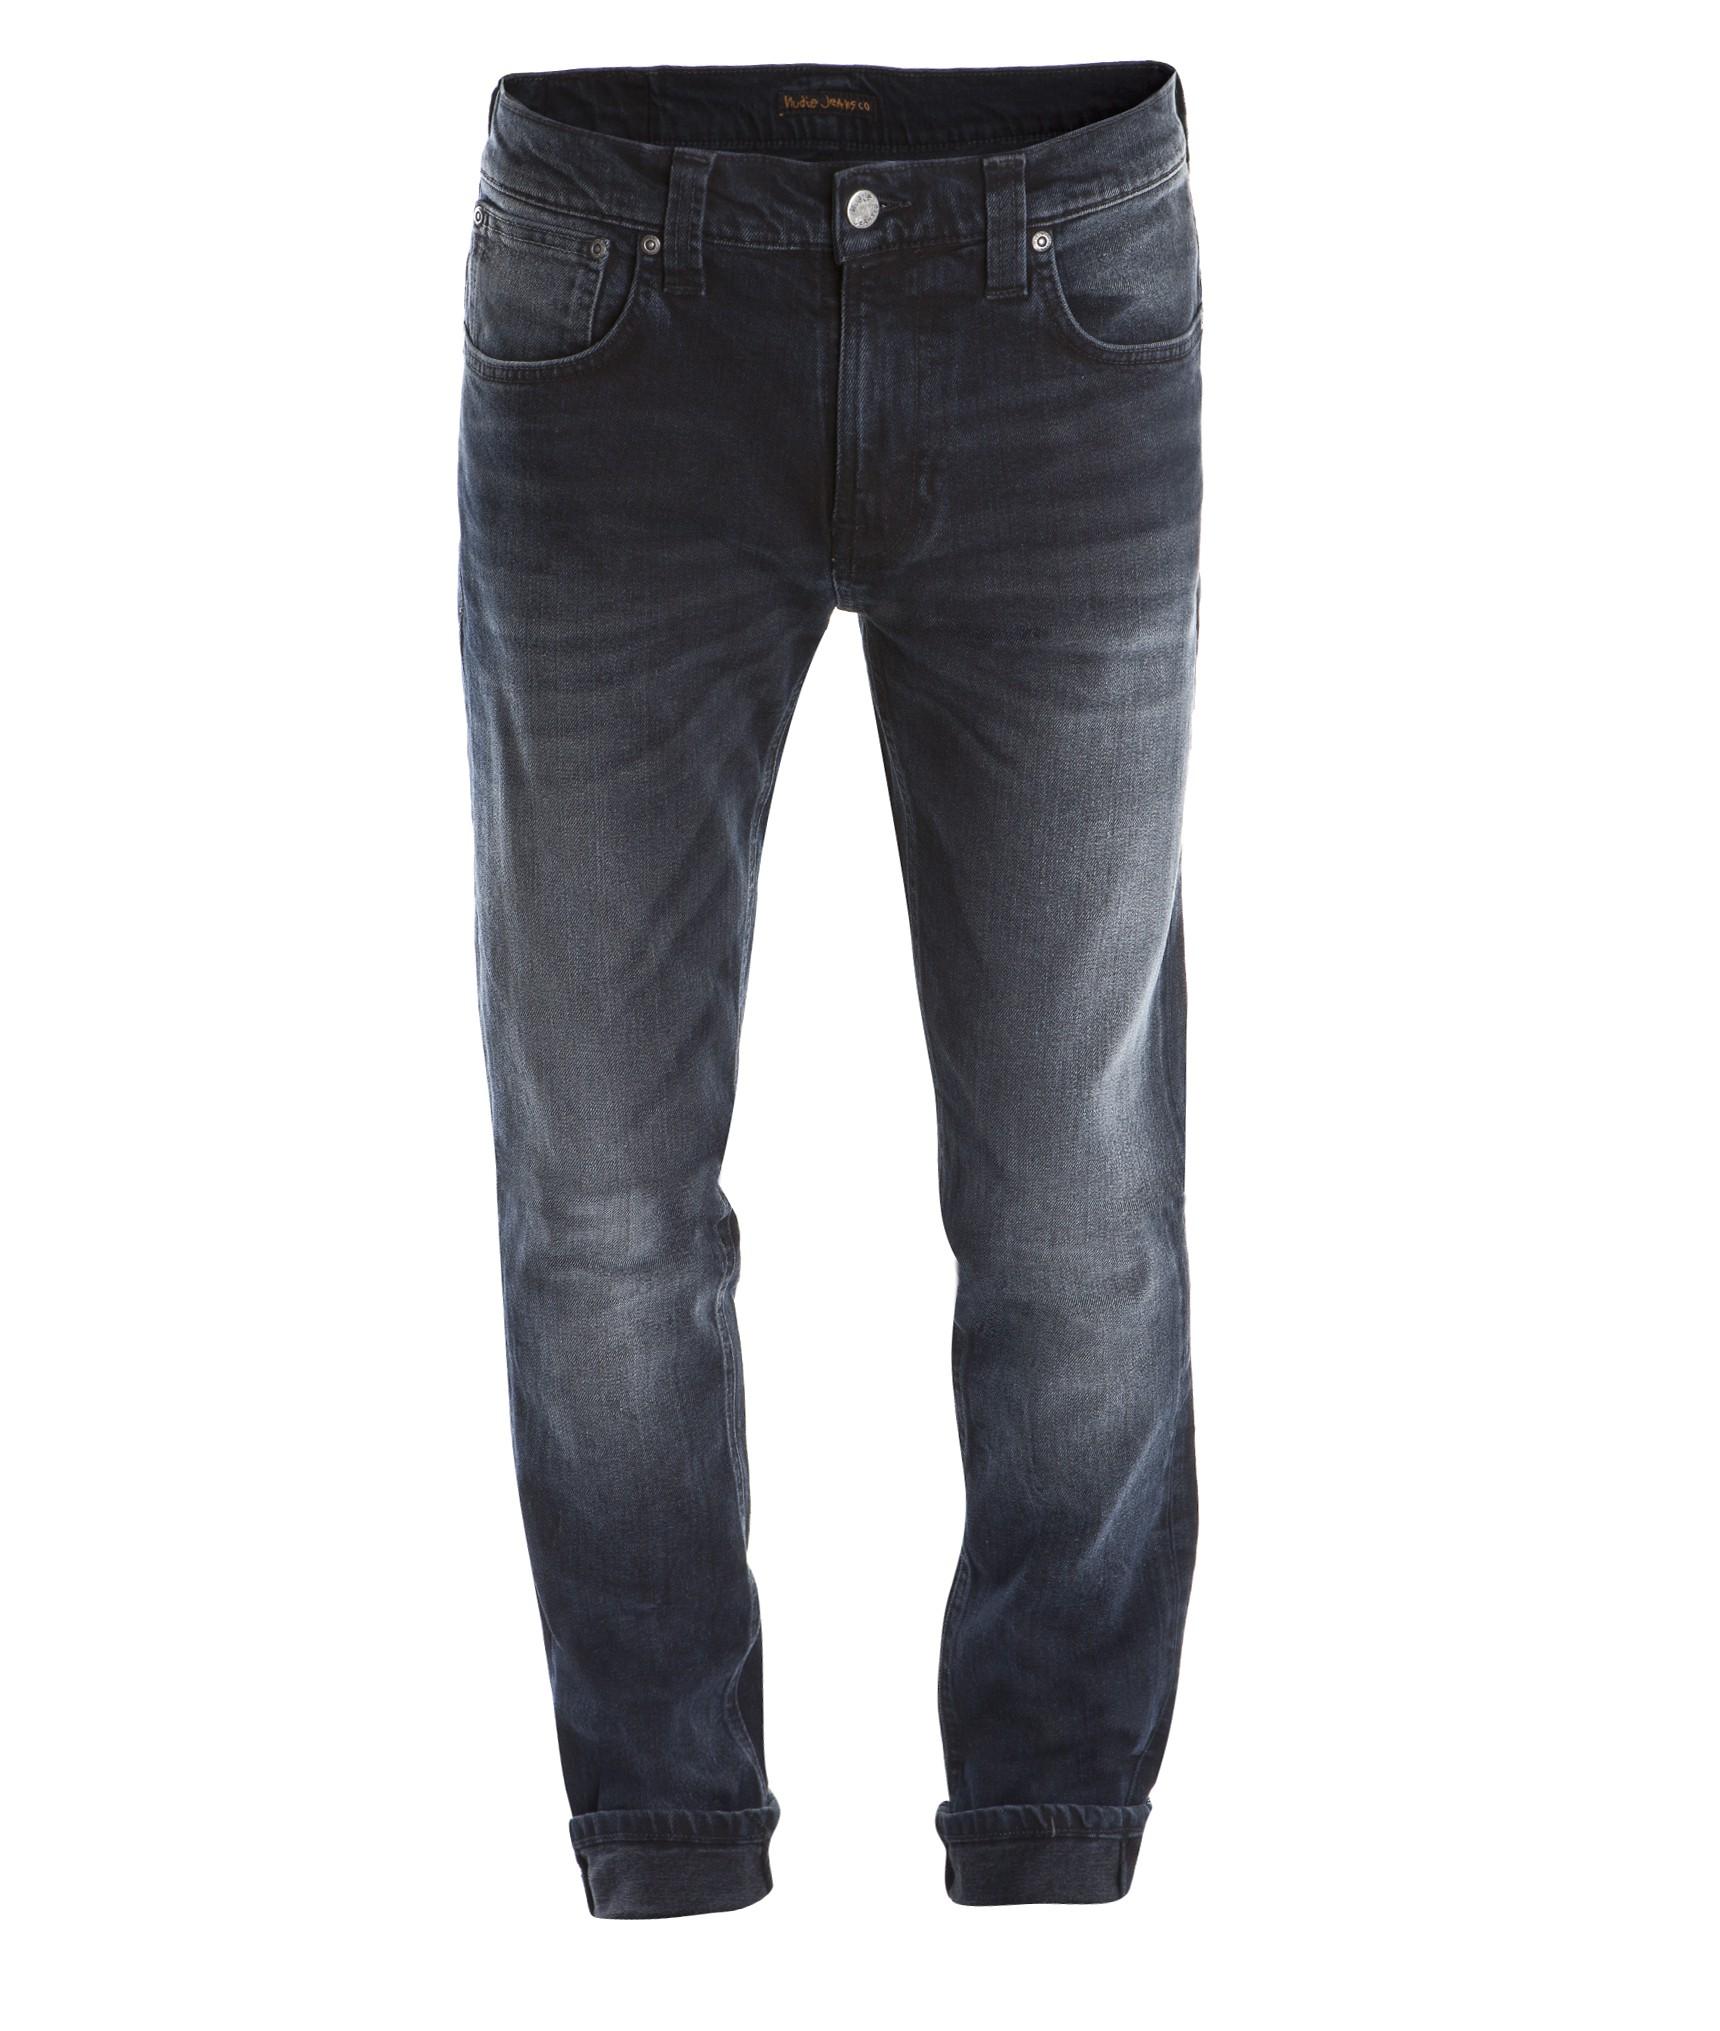 nudie jeans tape ted blue black sale faire kleidung g nstig kaufen glore. Black Bedroom Furniture Sets. Home Design Ideas